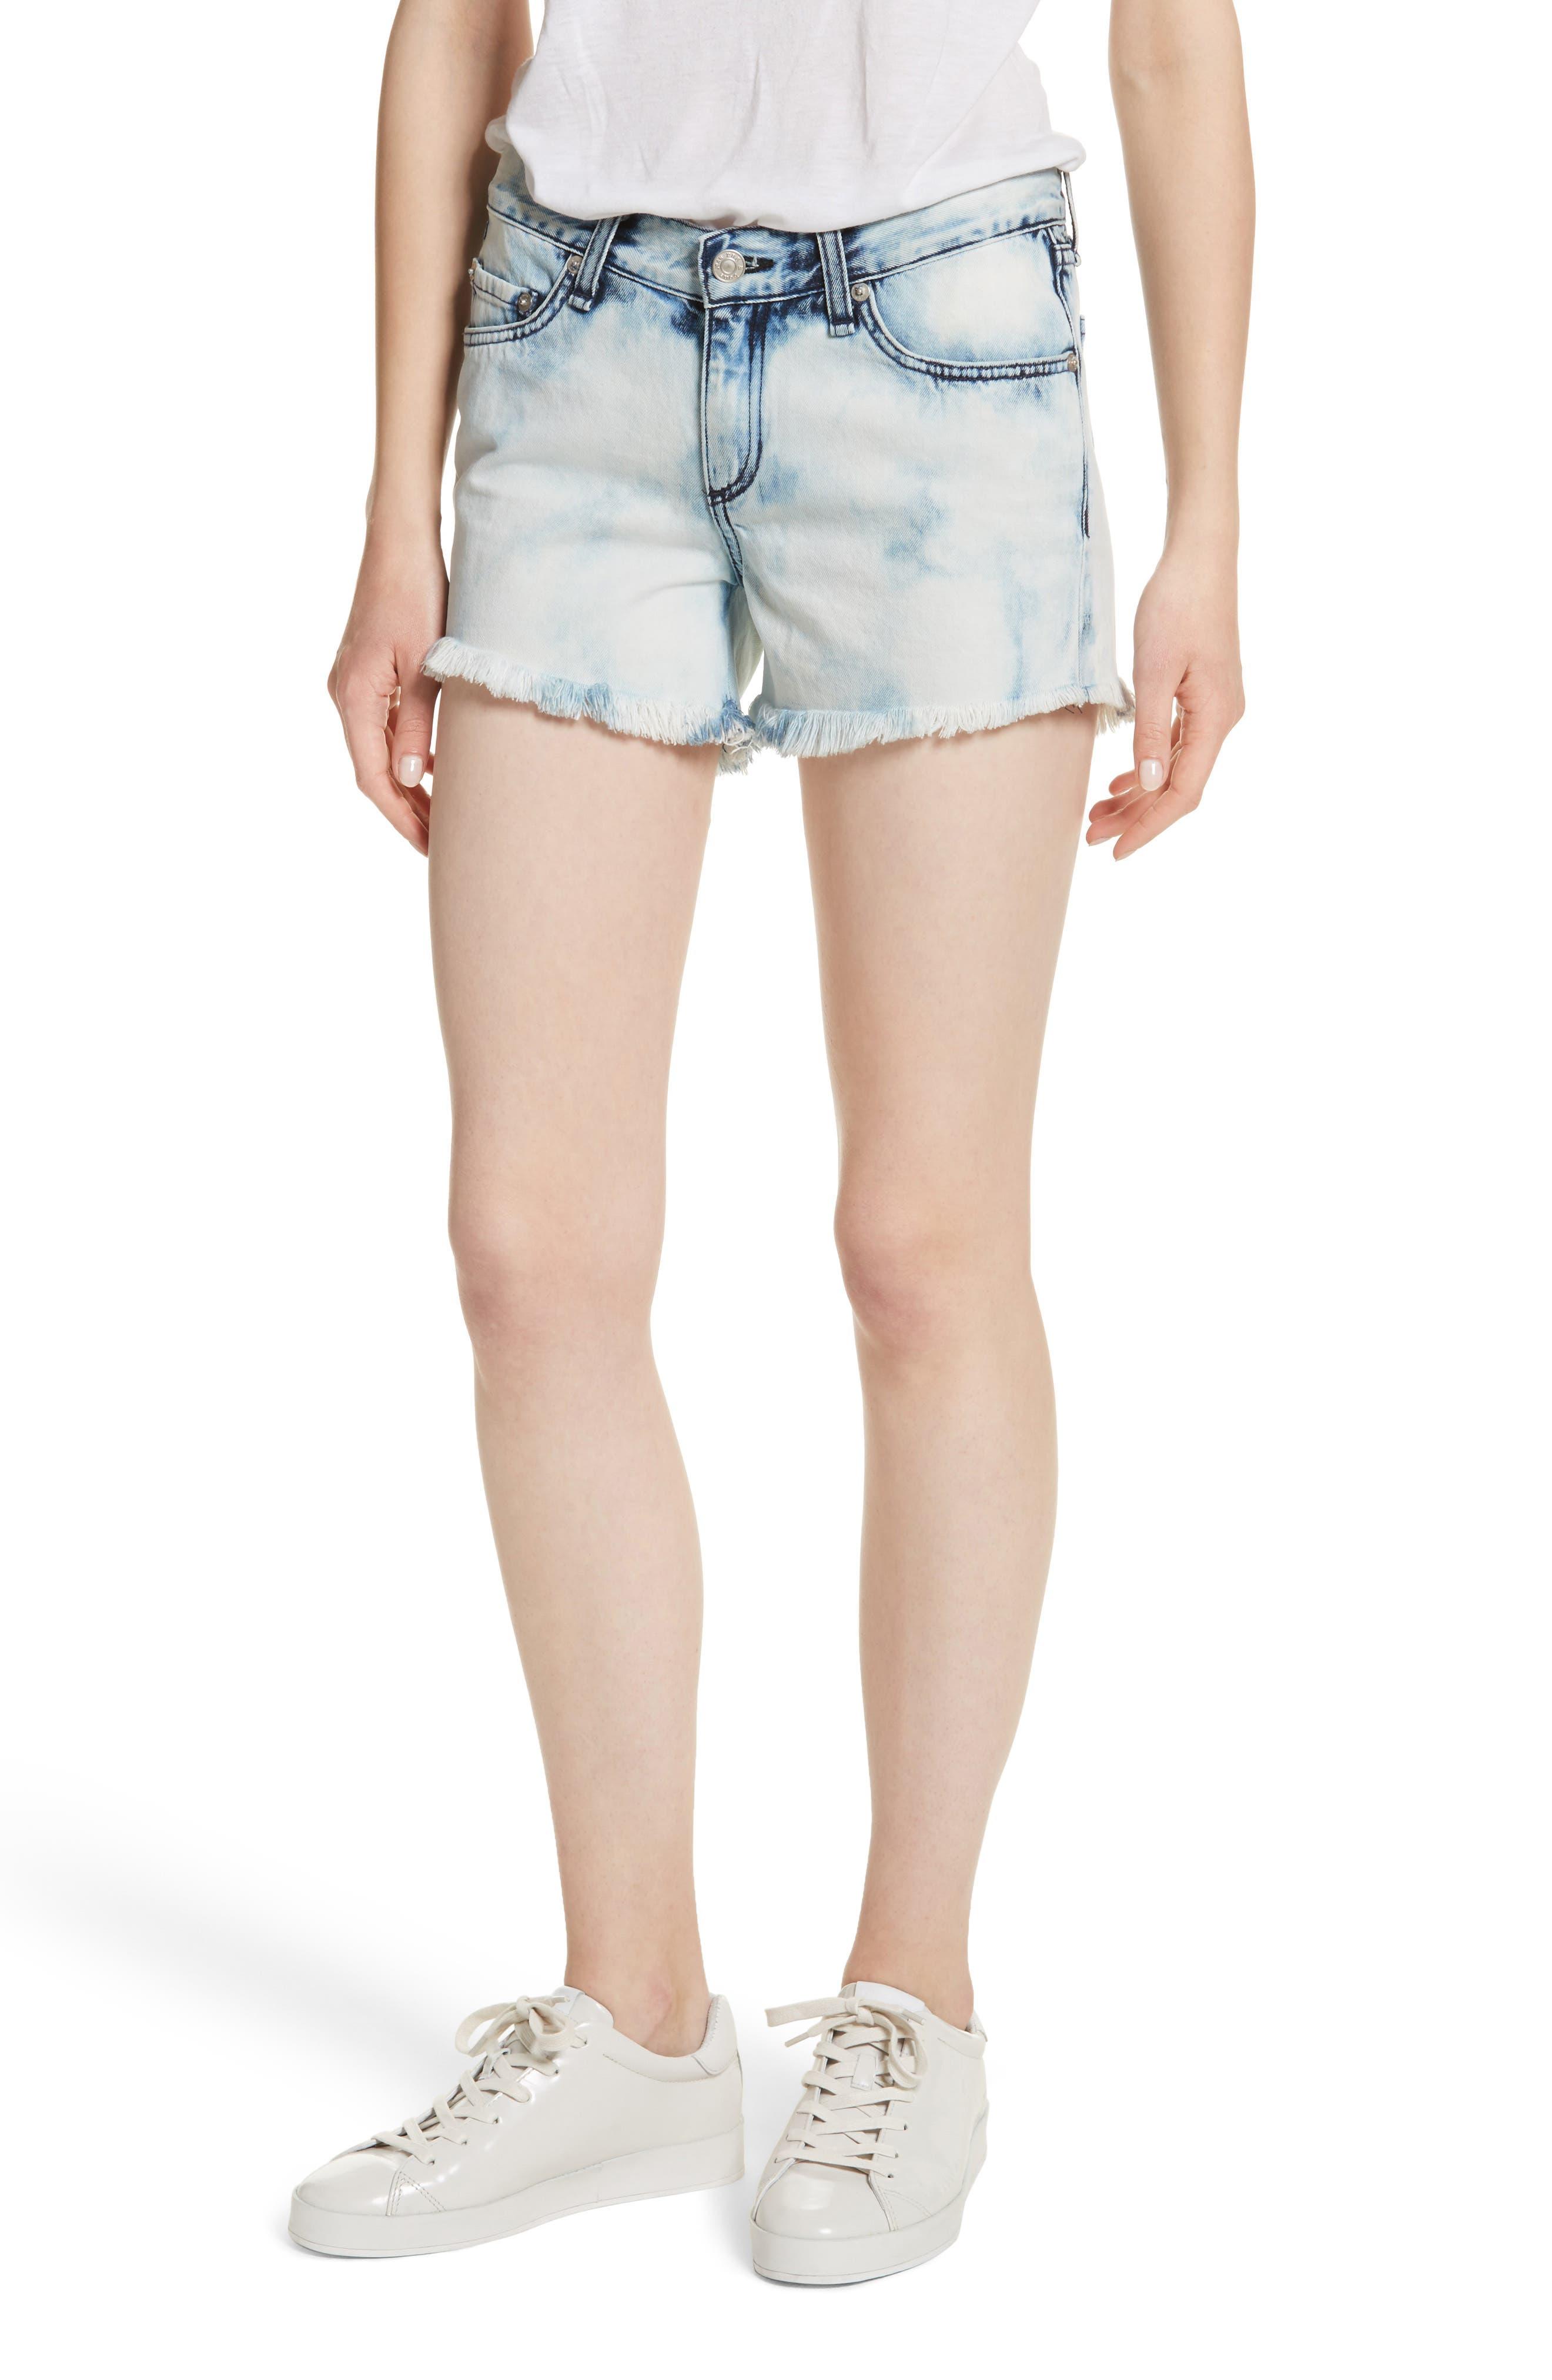 Alternate Image 1 Selected - rag & bone/JEAN Cutoff Denim Shorts (Bleach)